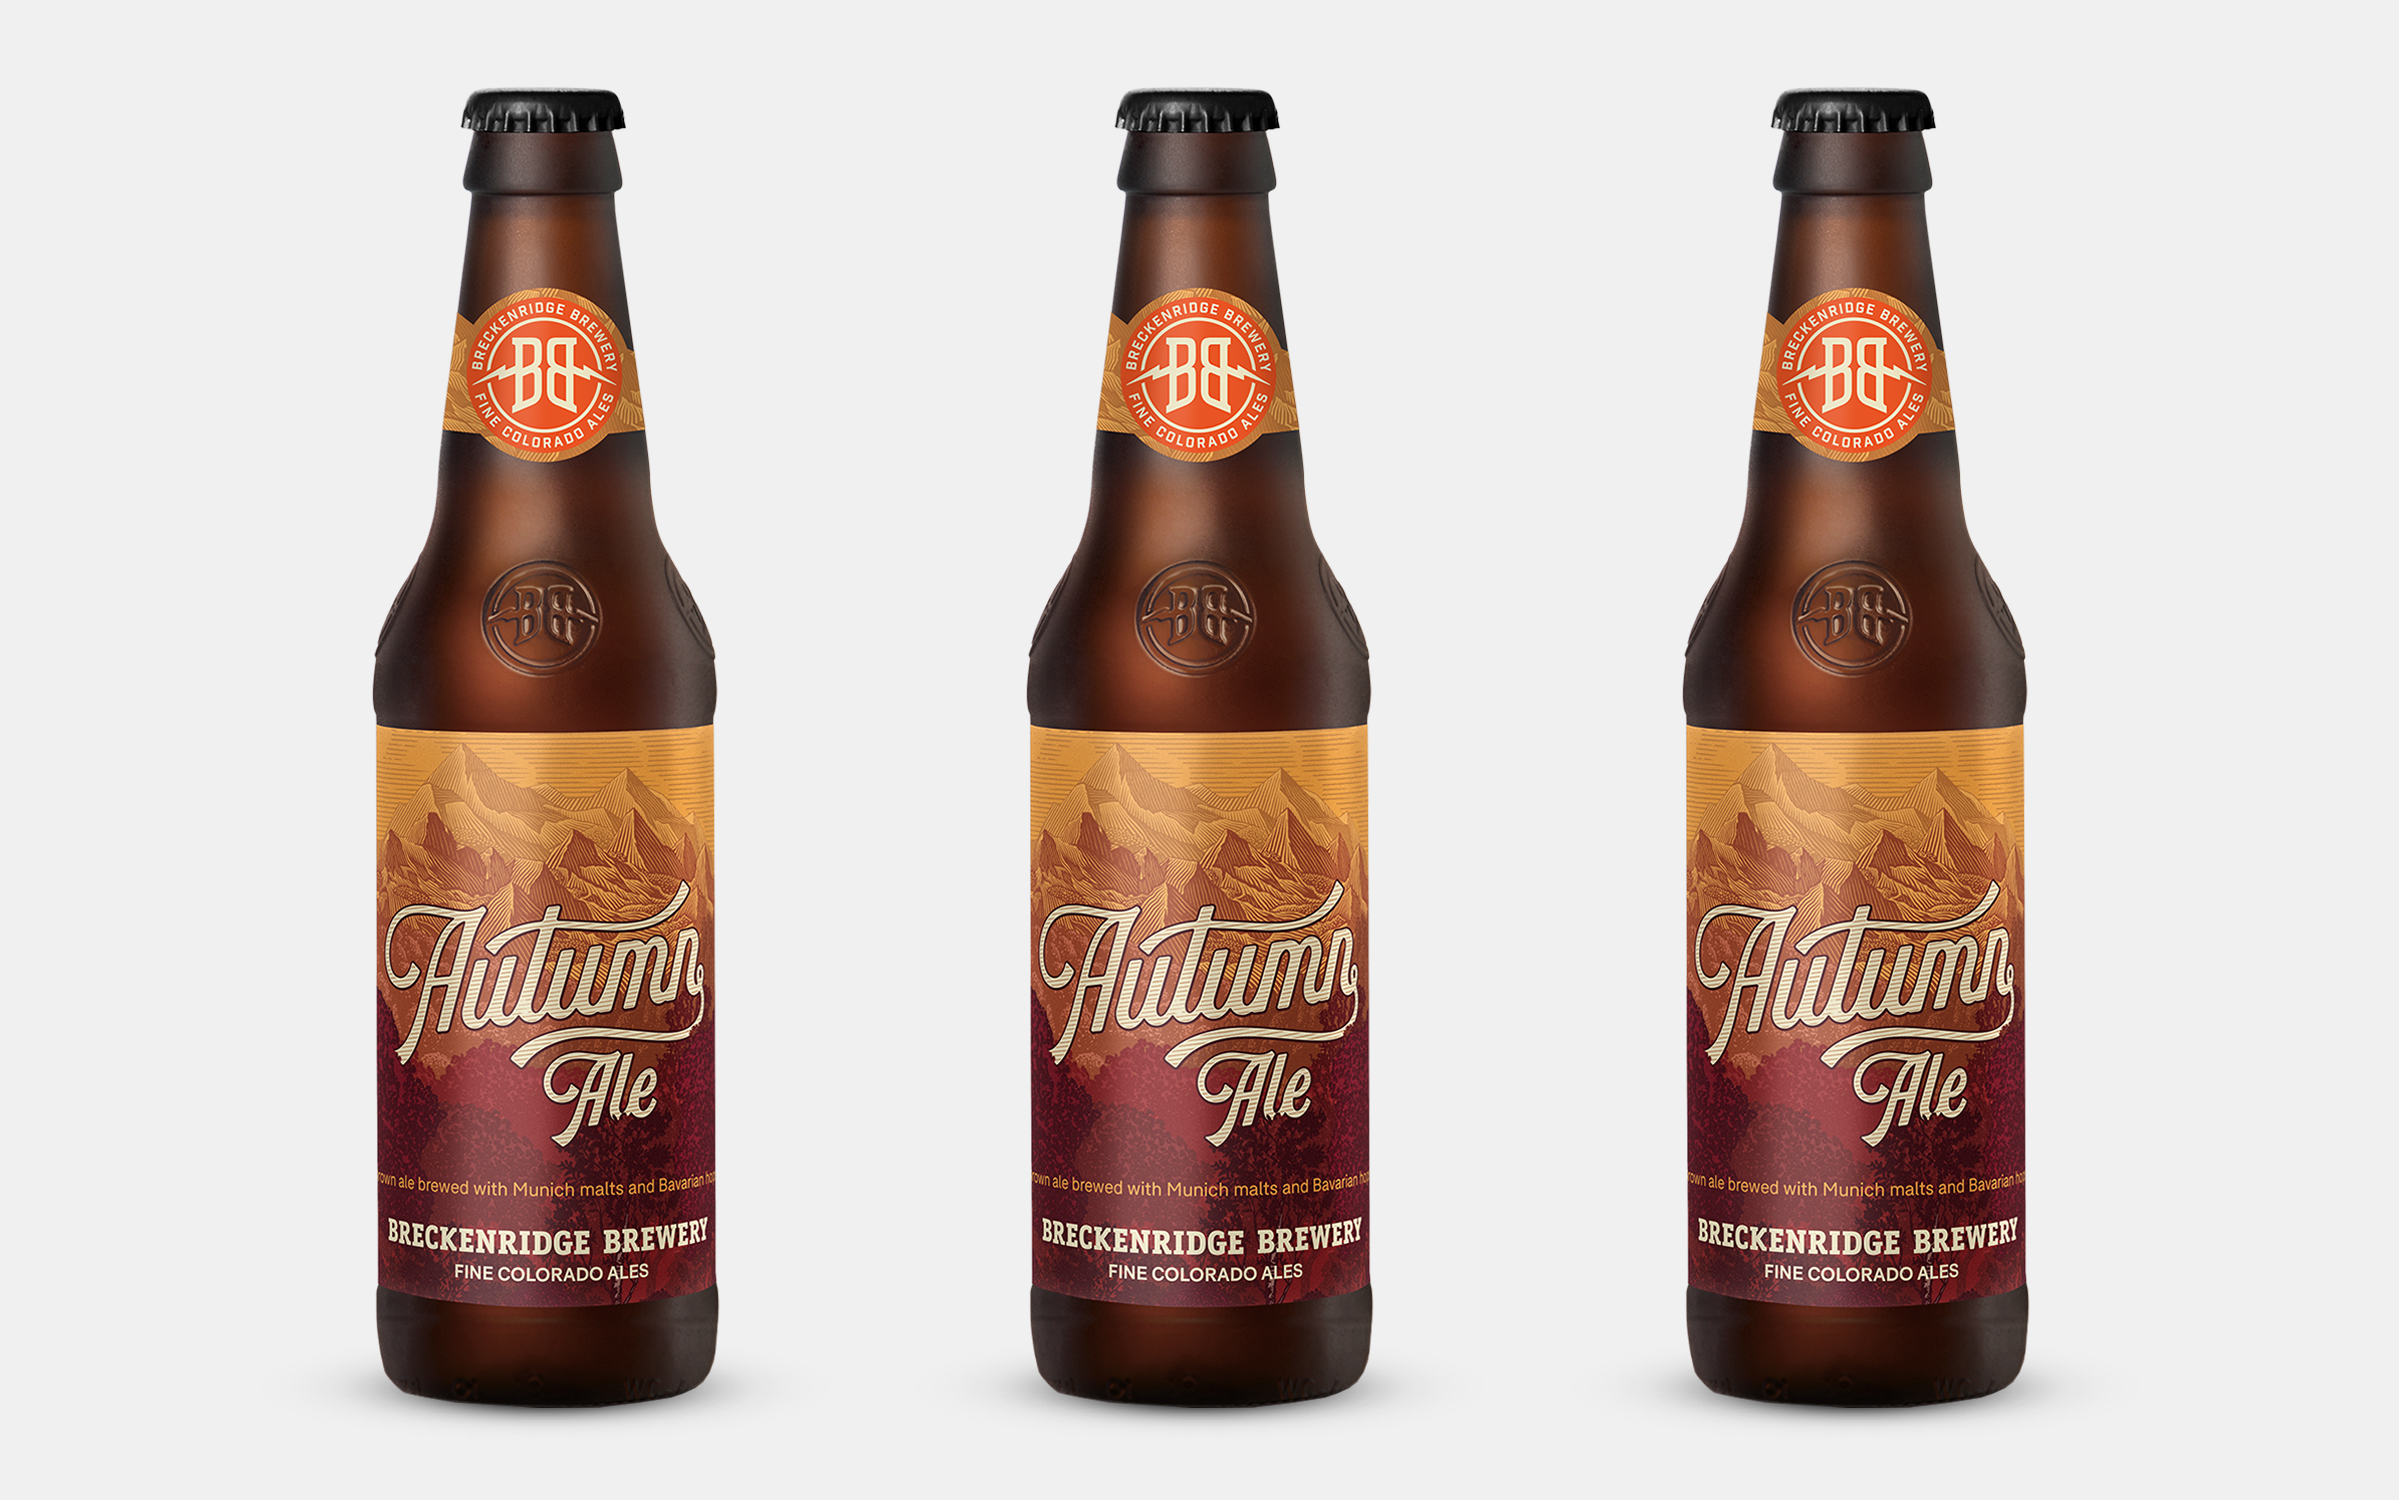 Breckenridge_Brewery Autumn Ale